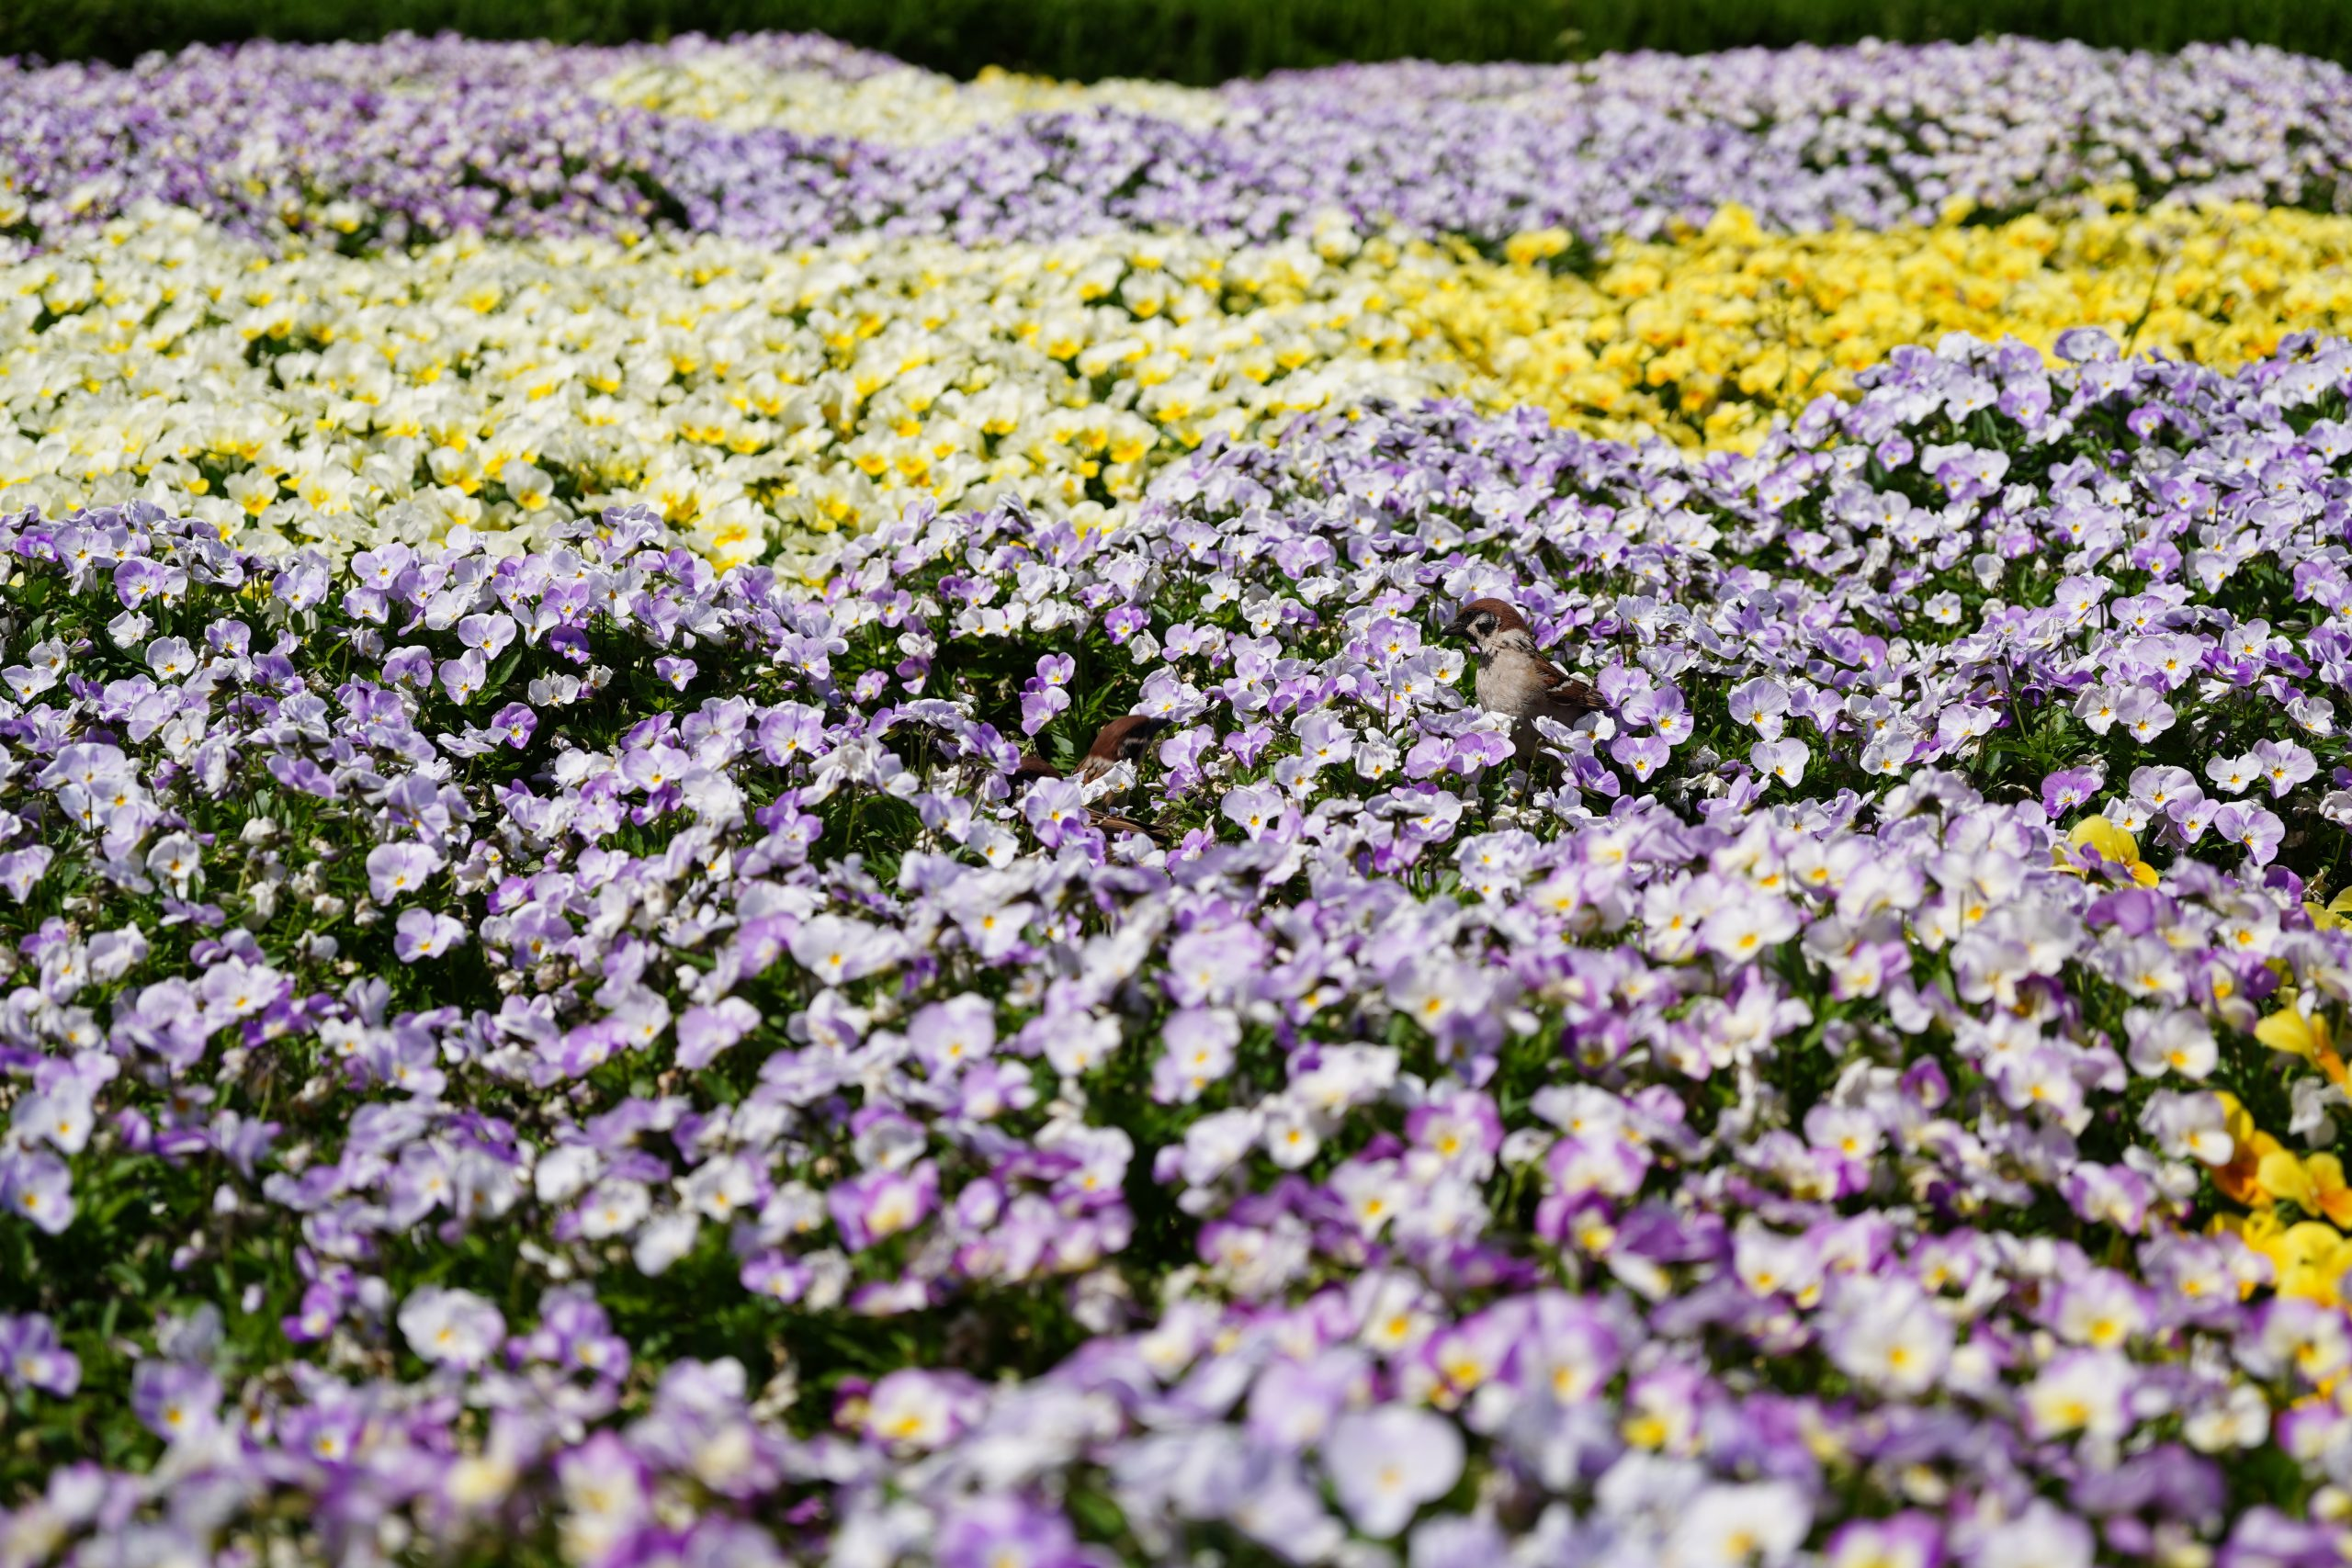 【SONY】花の中の雀を超解像ズーム